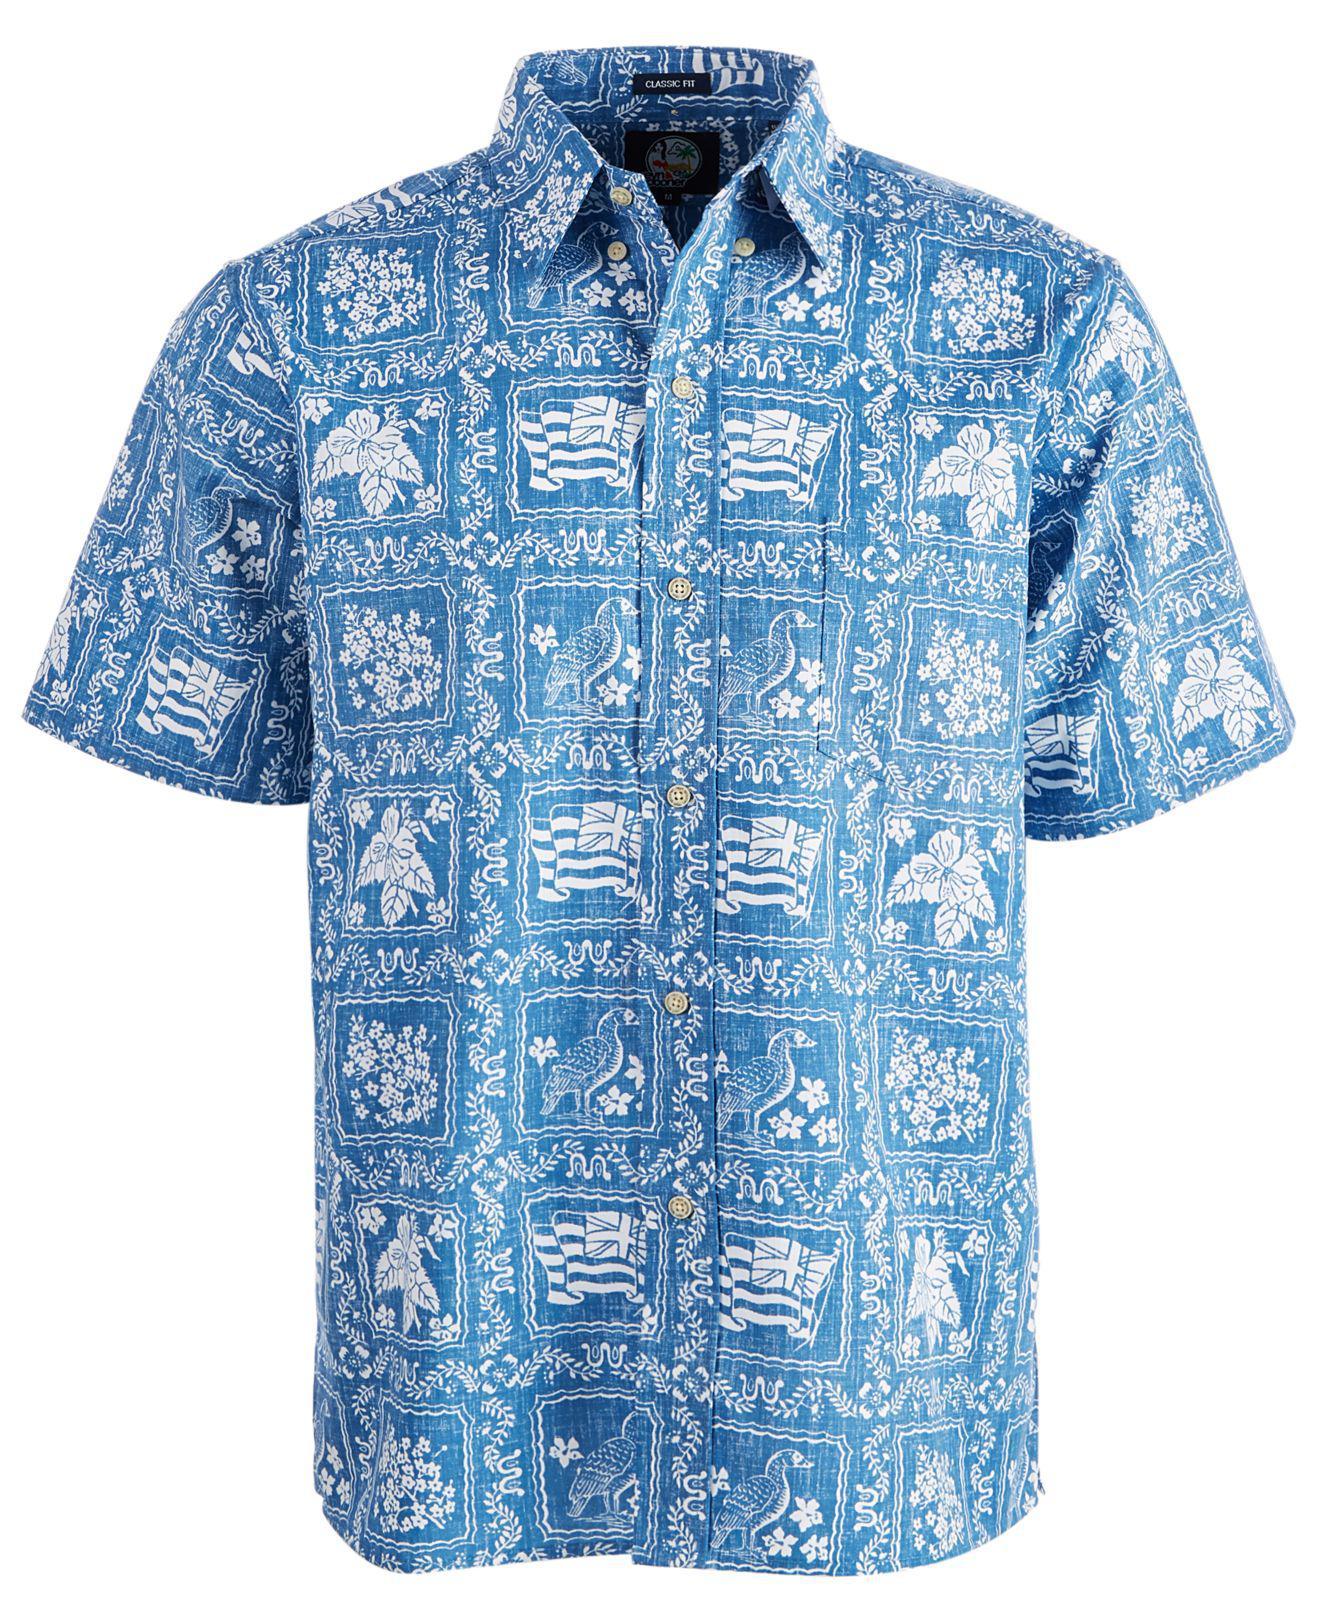 217e30938a07 Lyst - Reyn Spooner Printed Shirt in Blue for Men